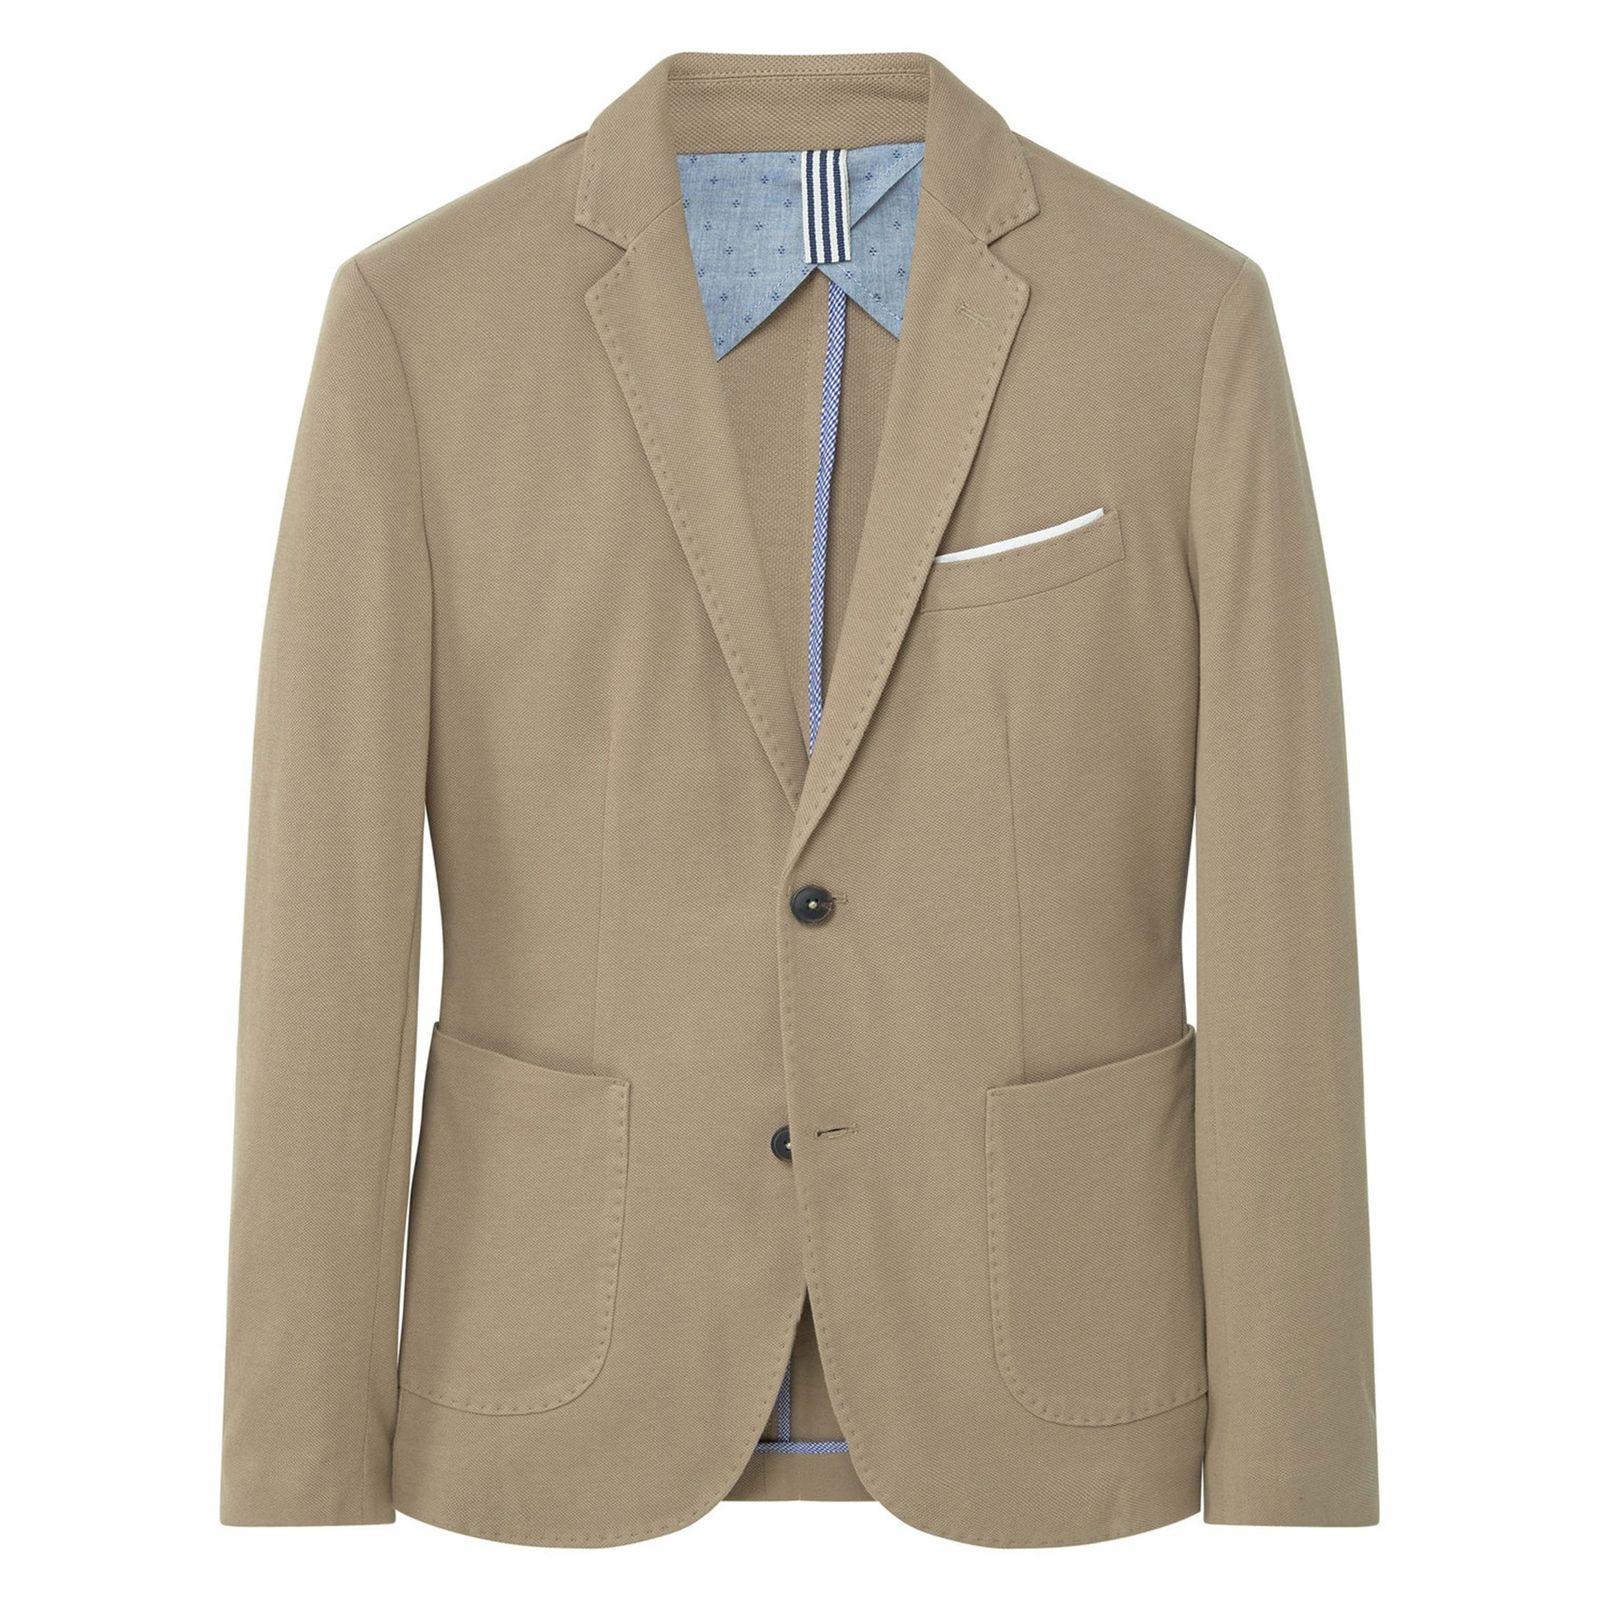 کت تک نخی مردانه - مانگو - بژ روشن - 1